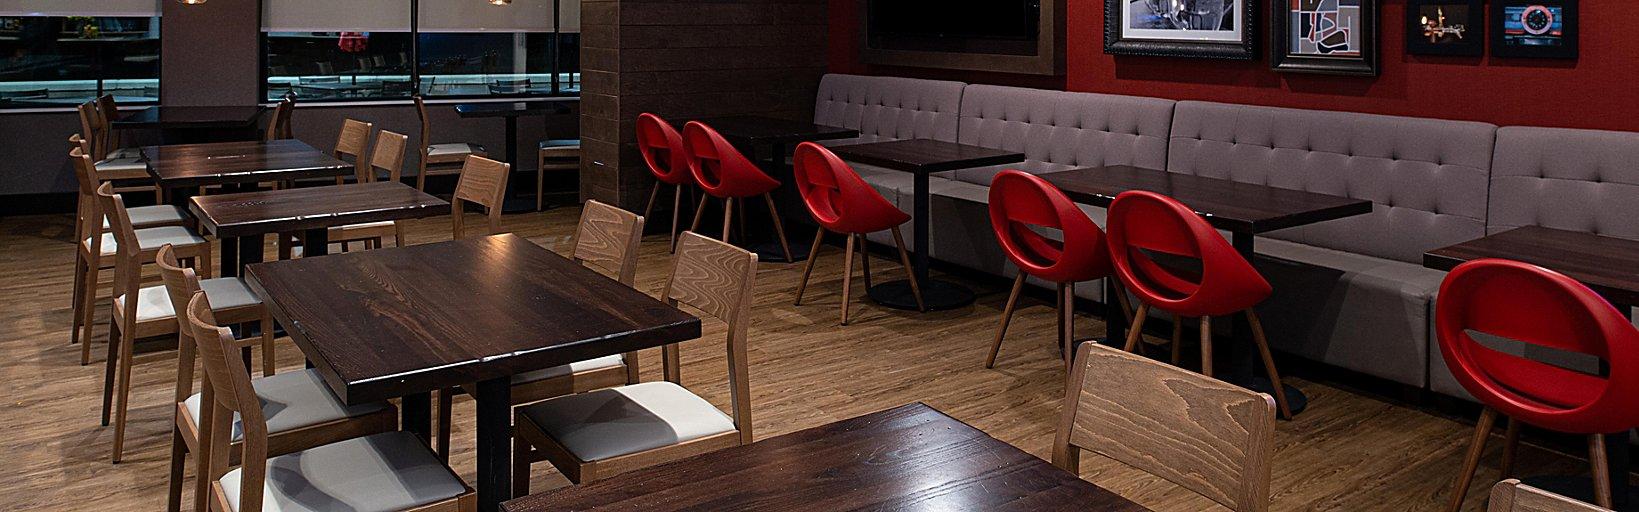 Resturants Open On Christmas Day 2021 Idaho Falls Restaurants Near Holiday Inn Hotel Suites Idaho Falls